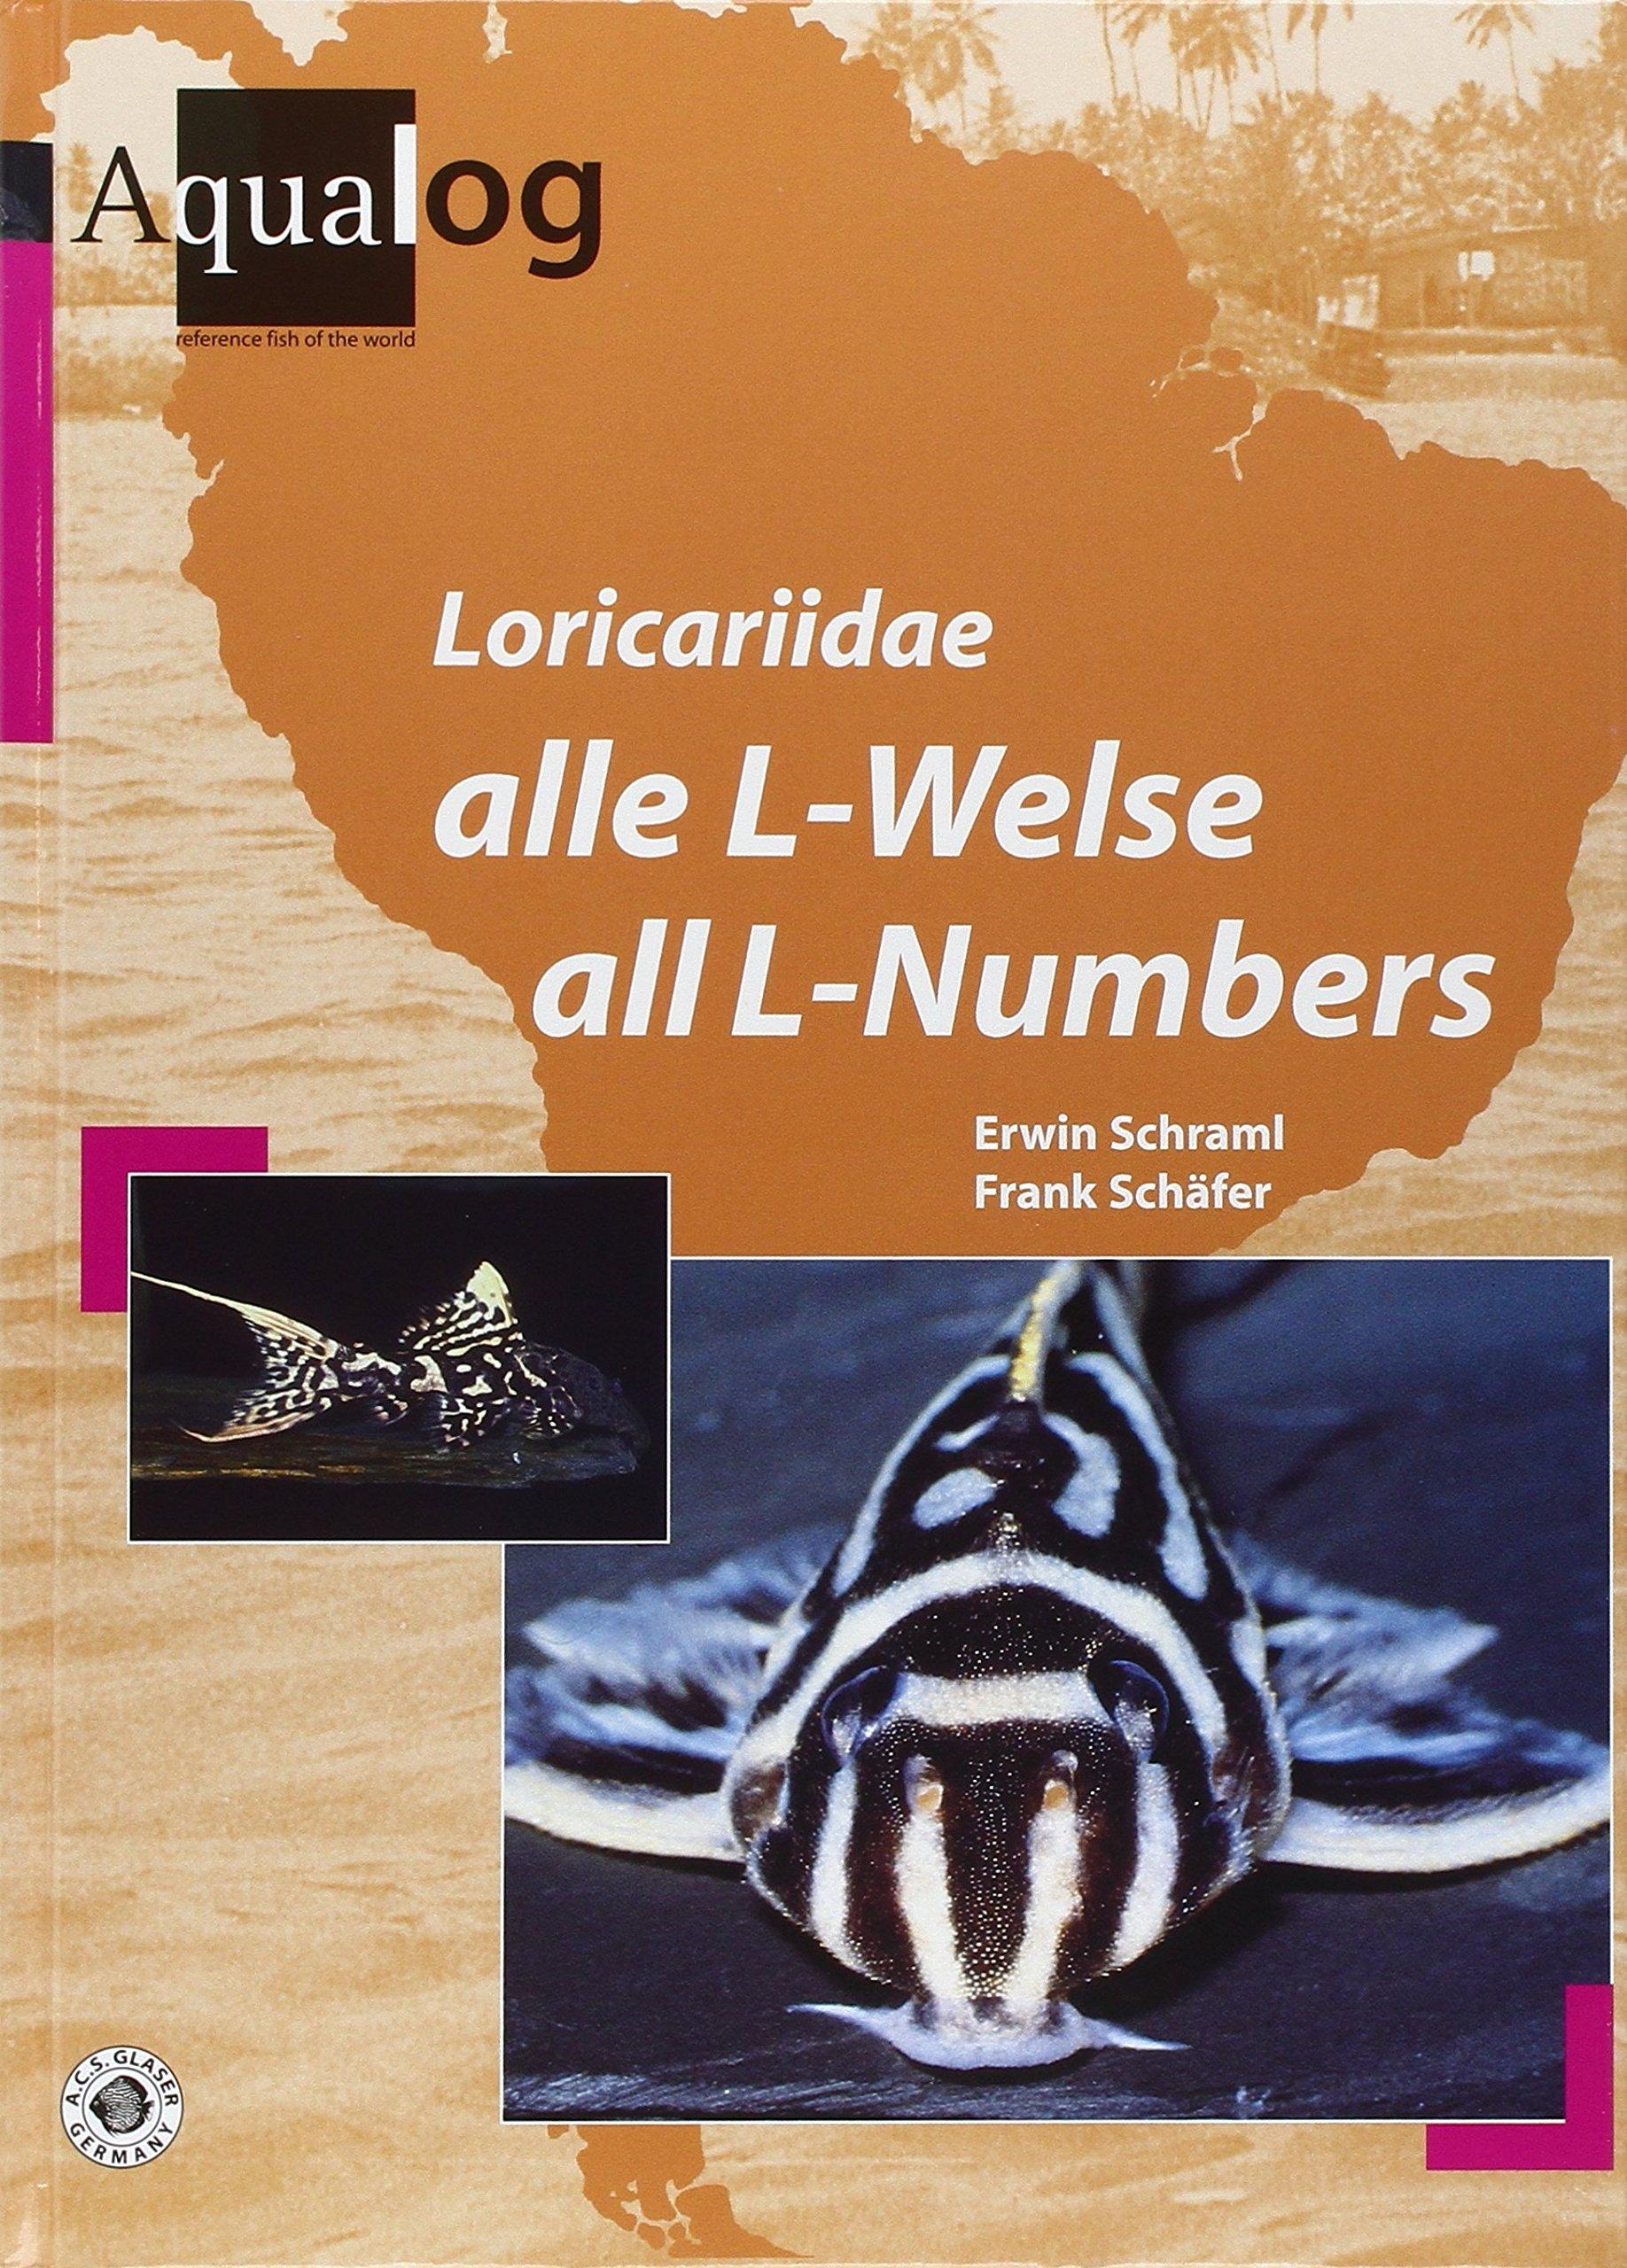 Loricariidae: Alle L-Welse. All L-Numbers: Amazon.es: Erwin Schraml, Frank Schäfer, Mary Bailey: Libros en idiomas extranjeros